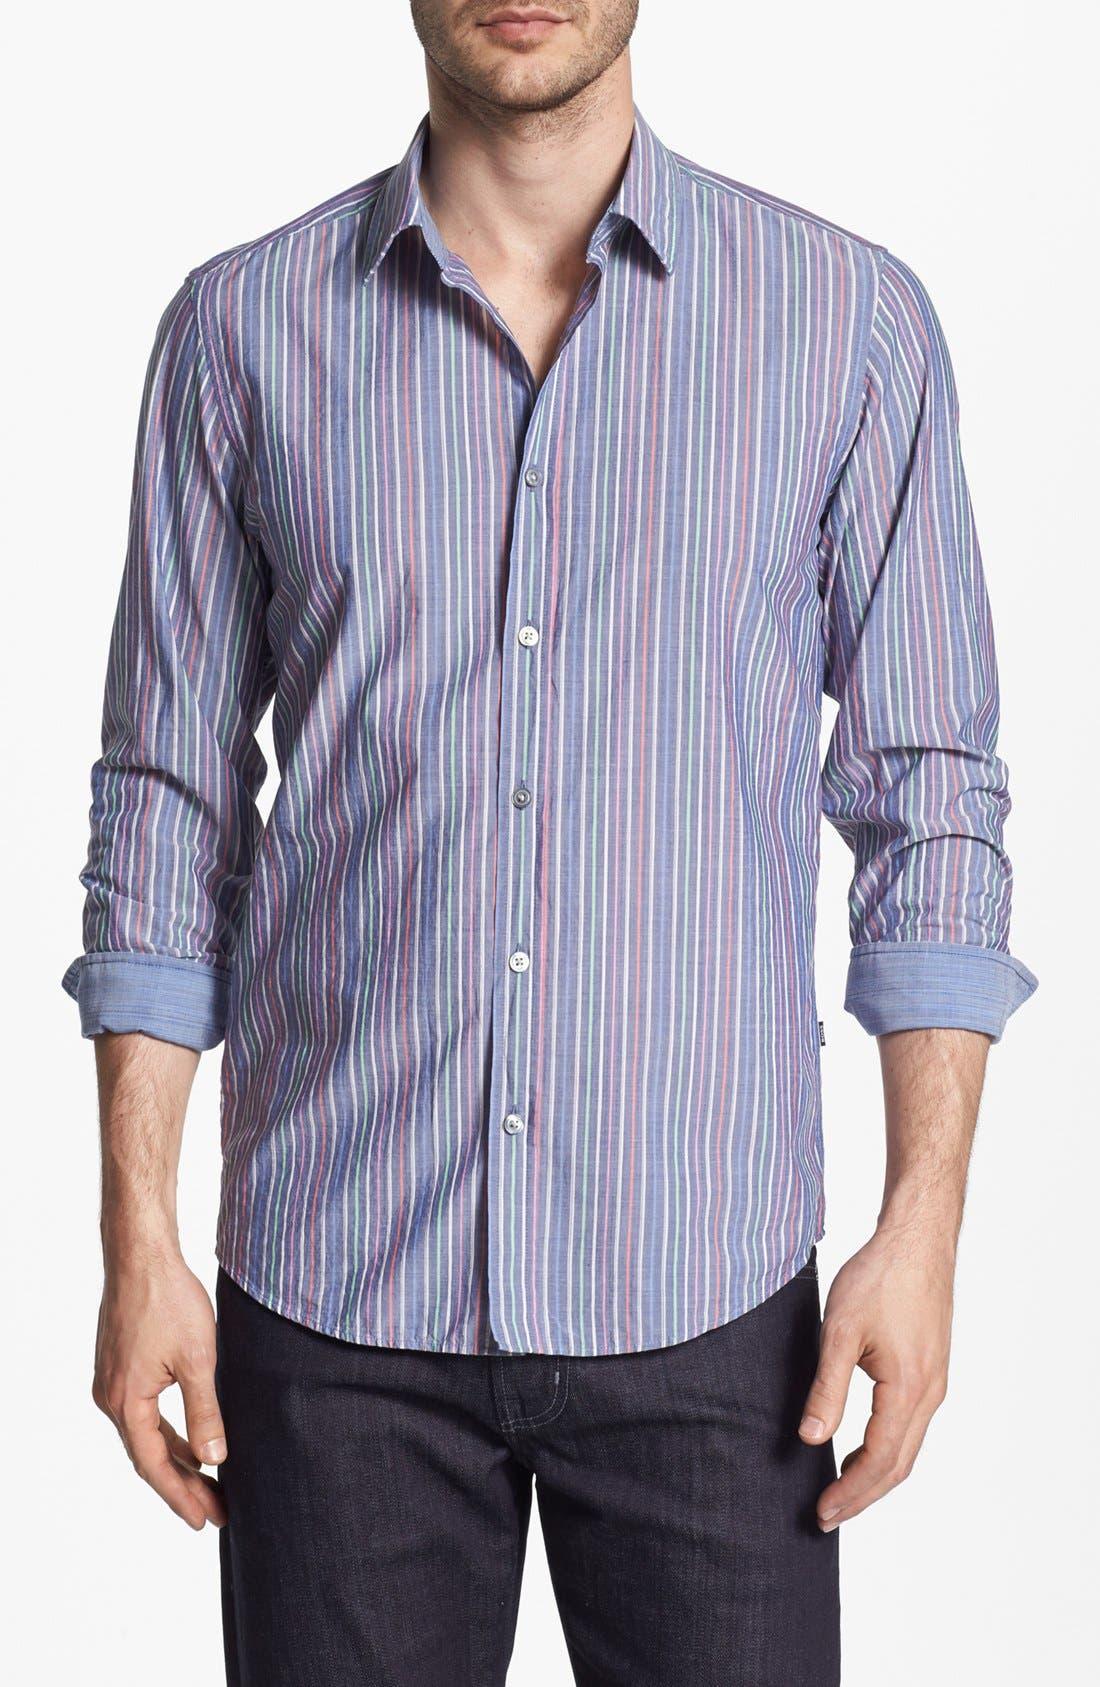 Alternate Image 1 Selected - BOSS HUGO BOSS 'Lucas' Regular Fit Sport Shirt